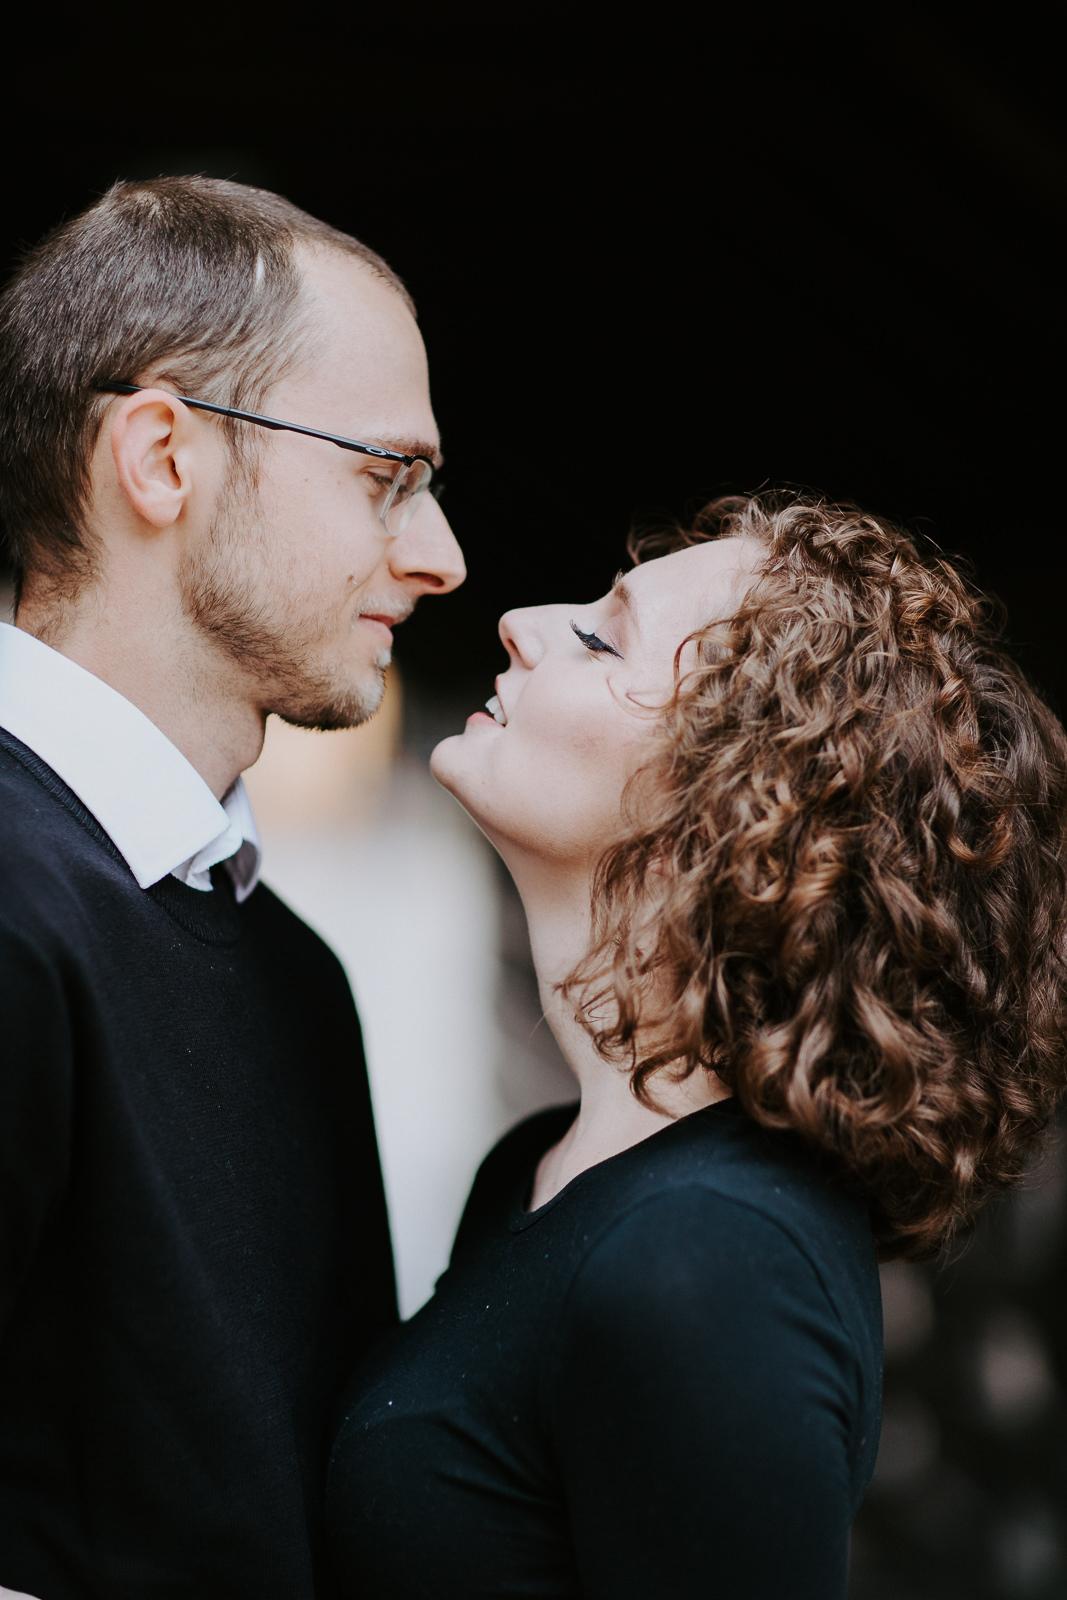 Vail Colorado bridge couple kissing